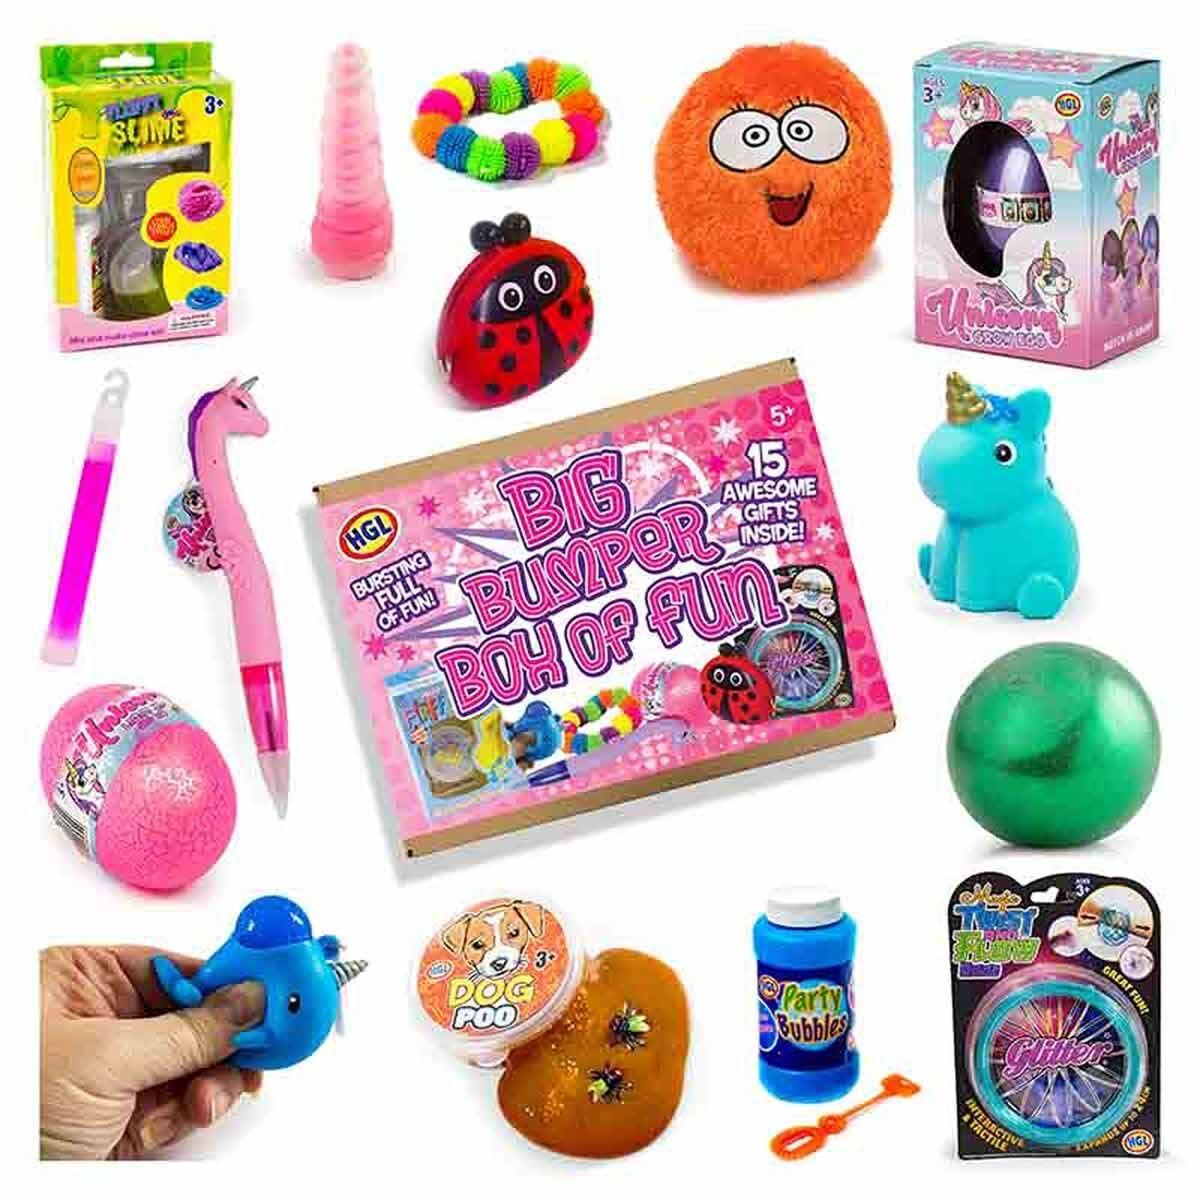 Big Pink Bumper Box of Fun